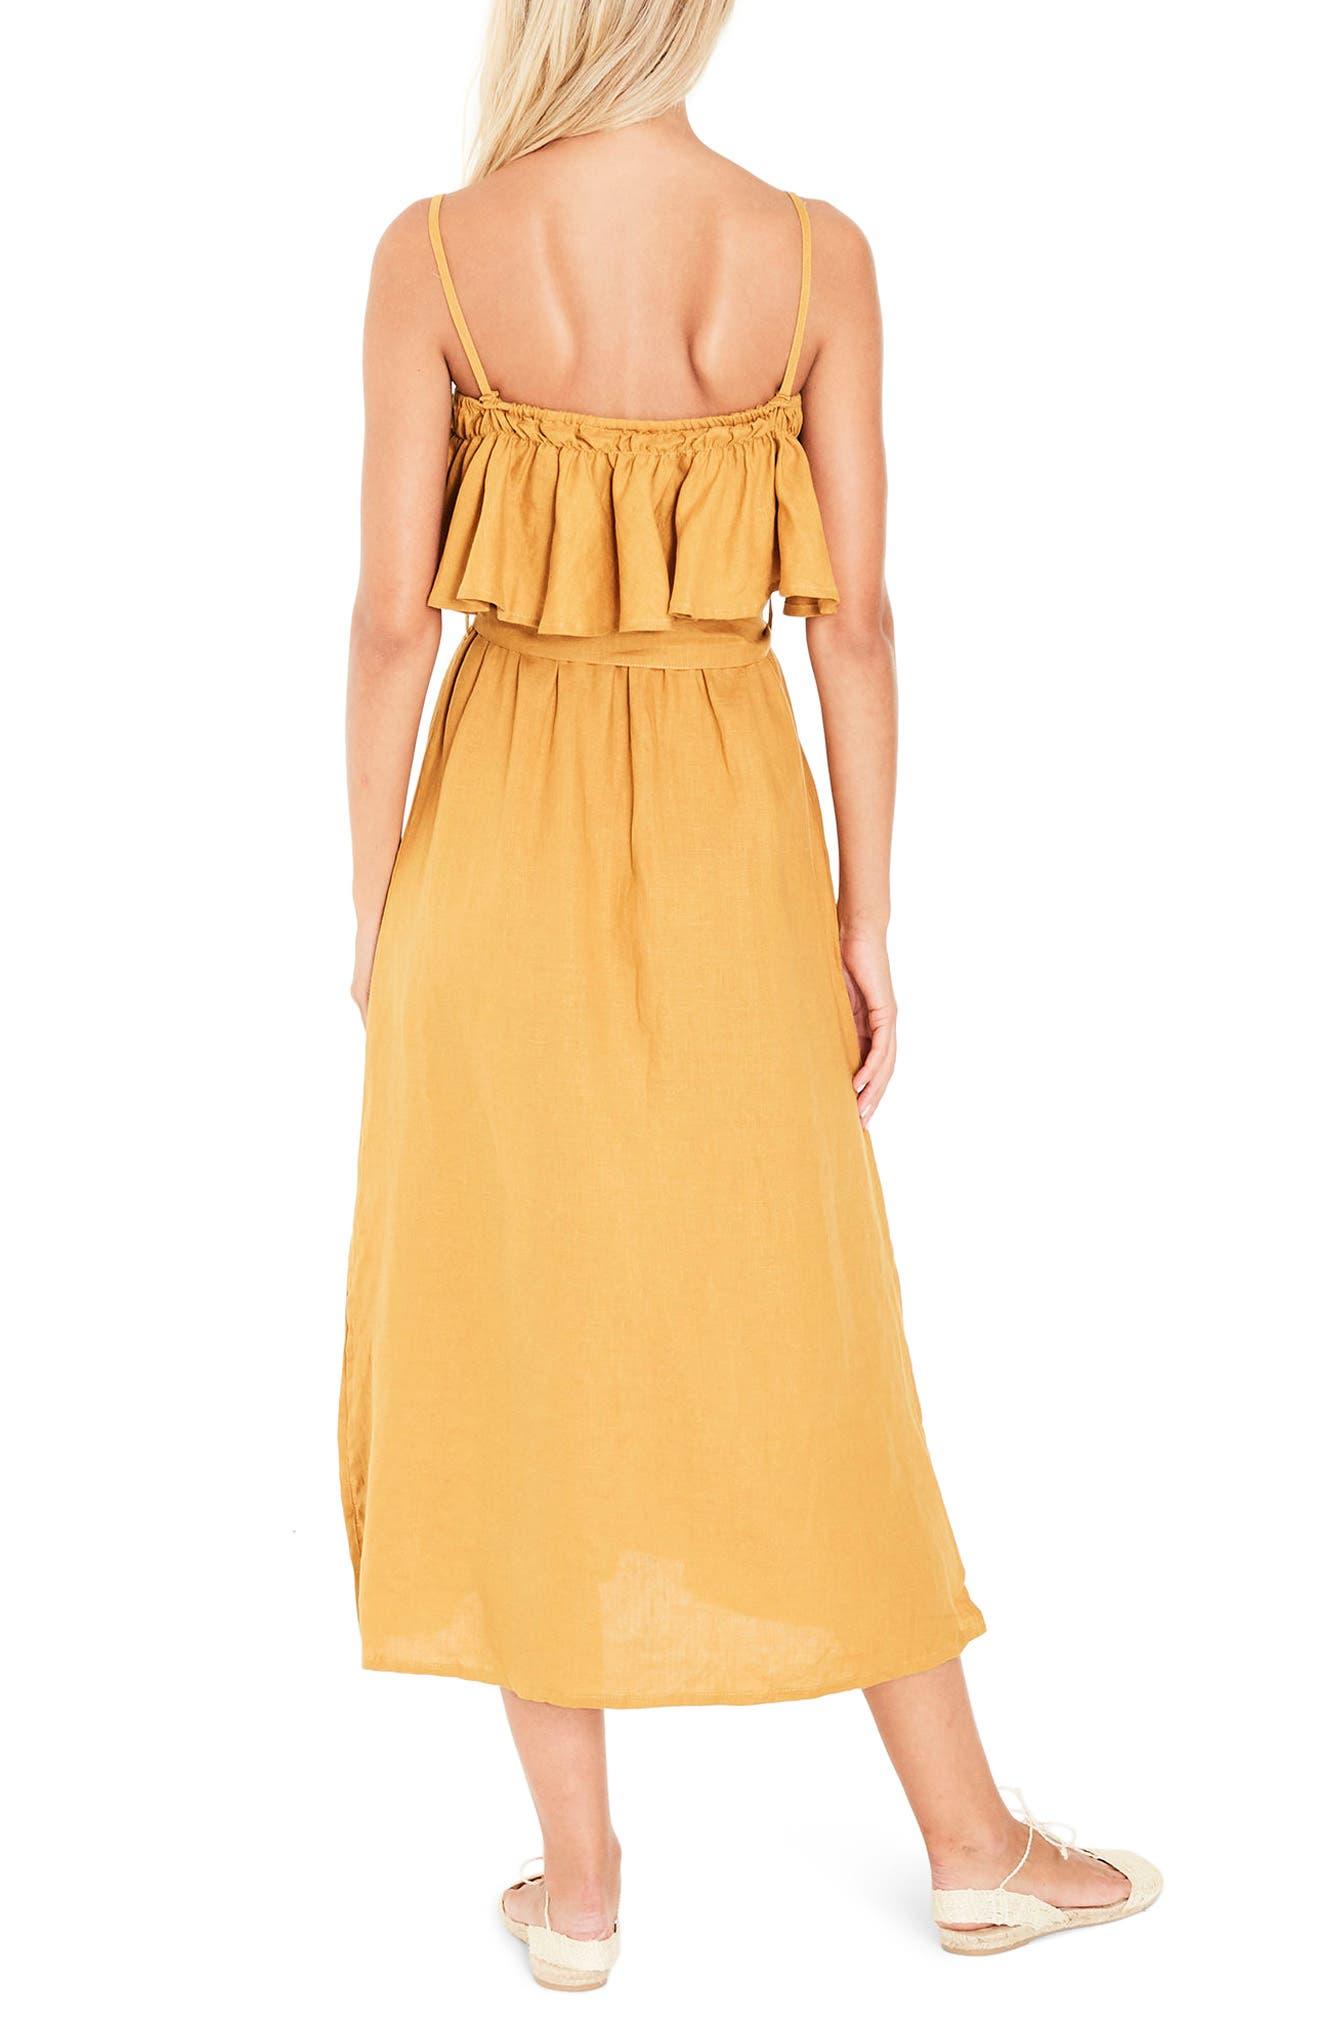 Santo Linen Midi Dress,                             Alternate thumbnail 3, color,                             Plain Marigold